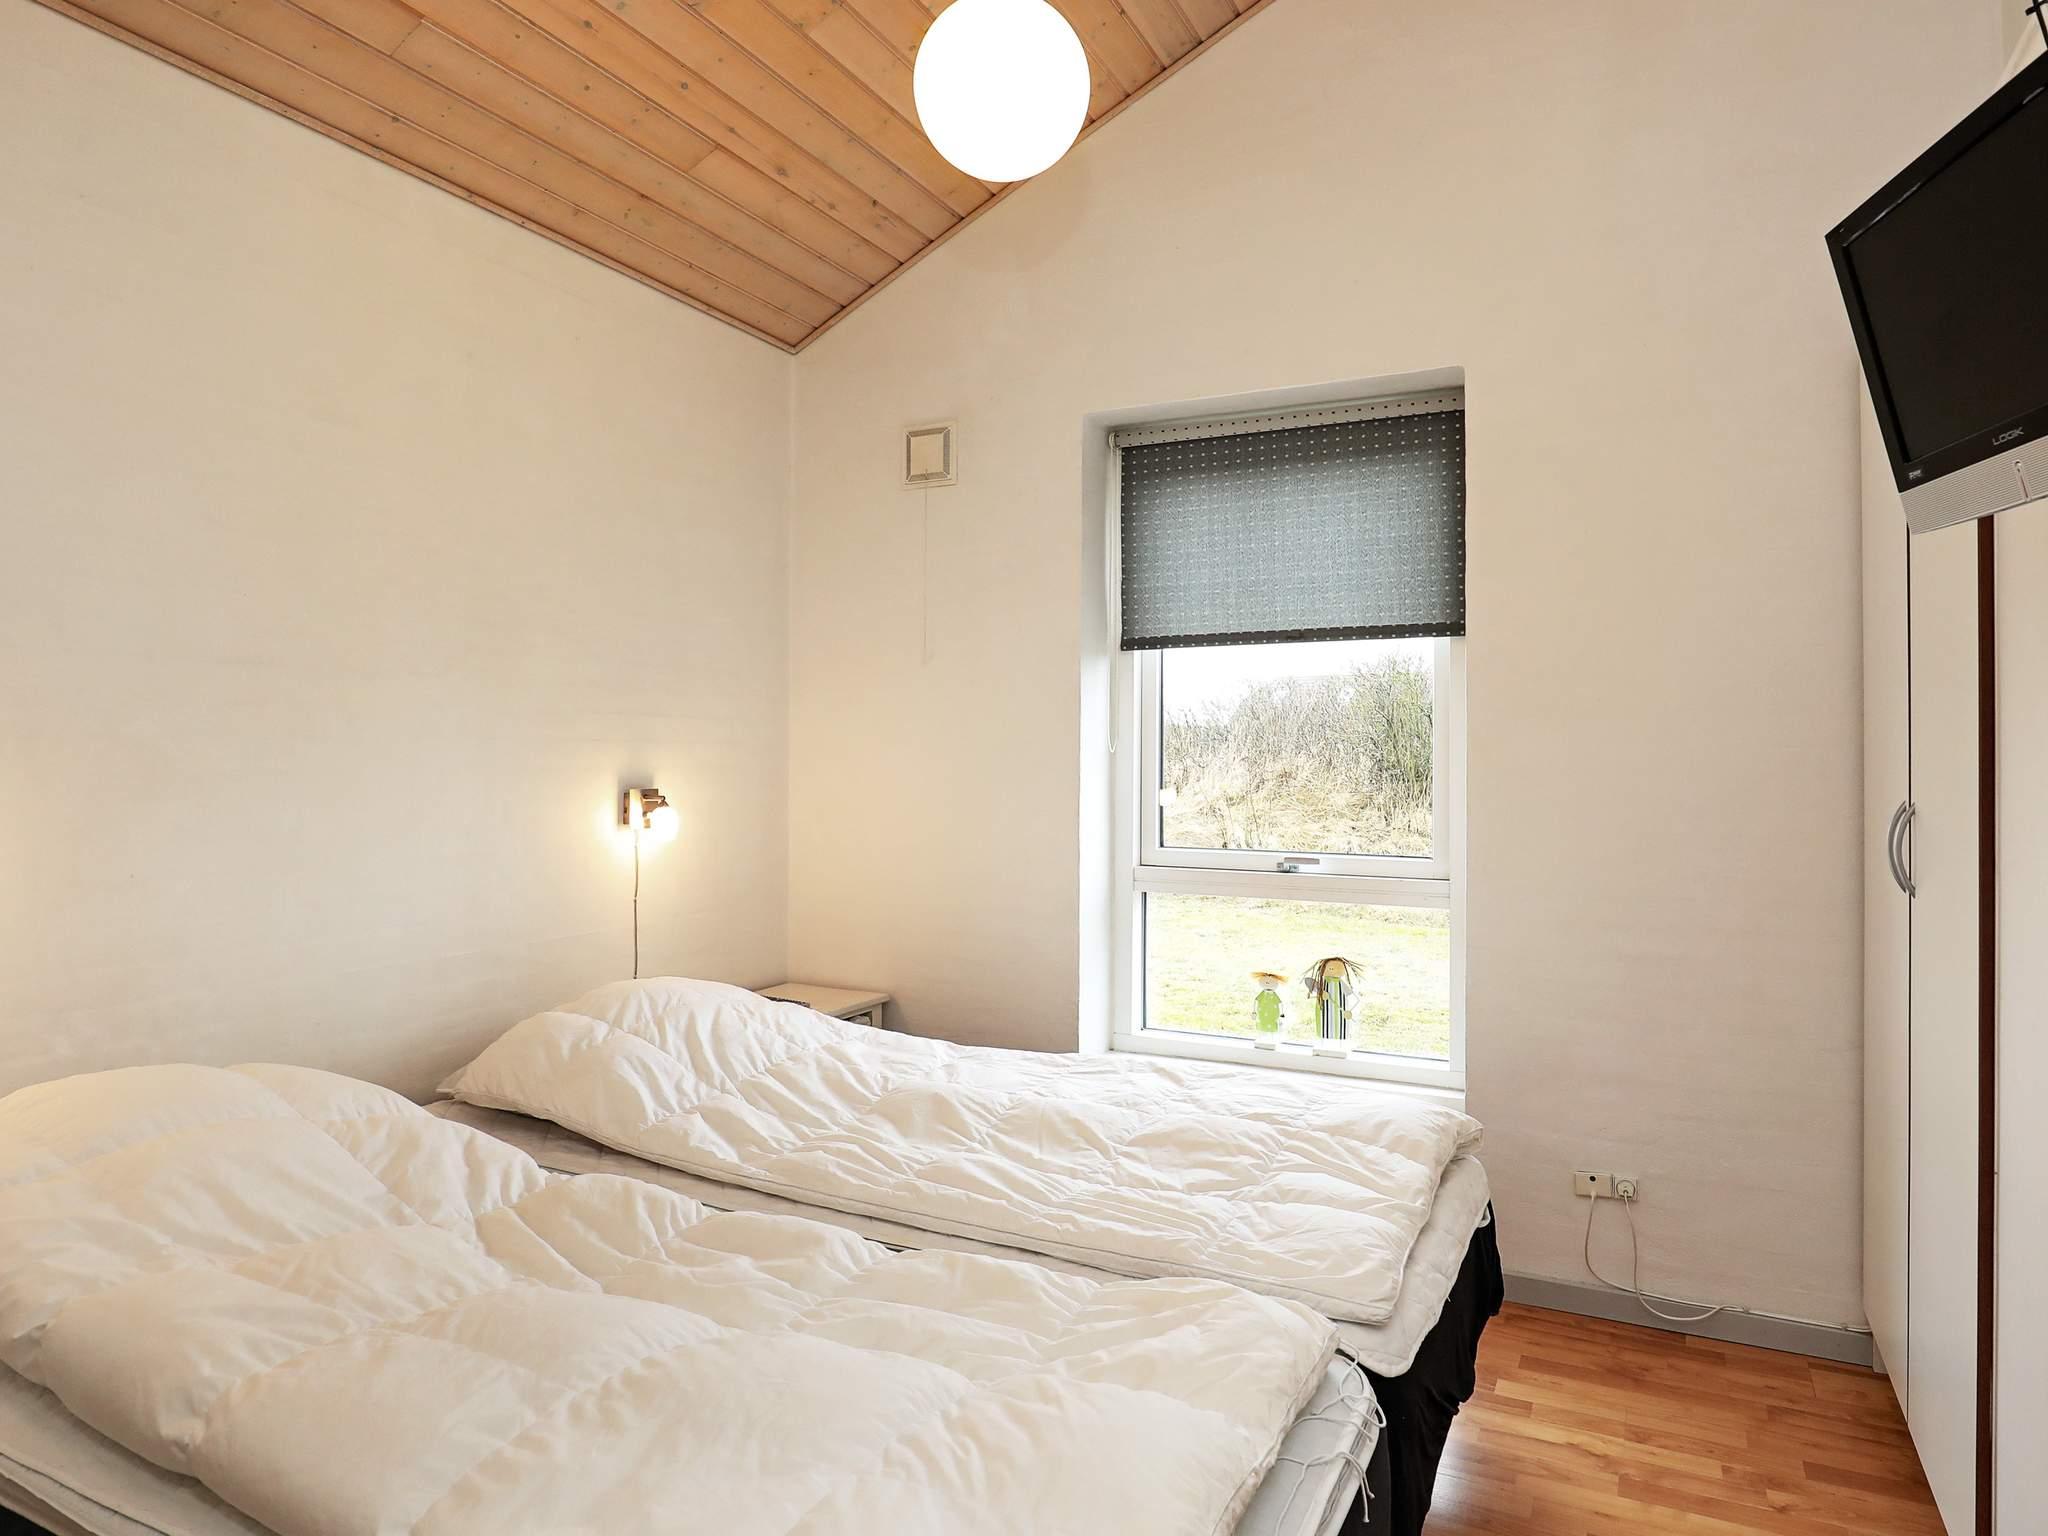 Ferienhaus Haurvig (125276), Hvide Sande, , Westjütland, Dänemark, Bild 9